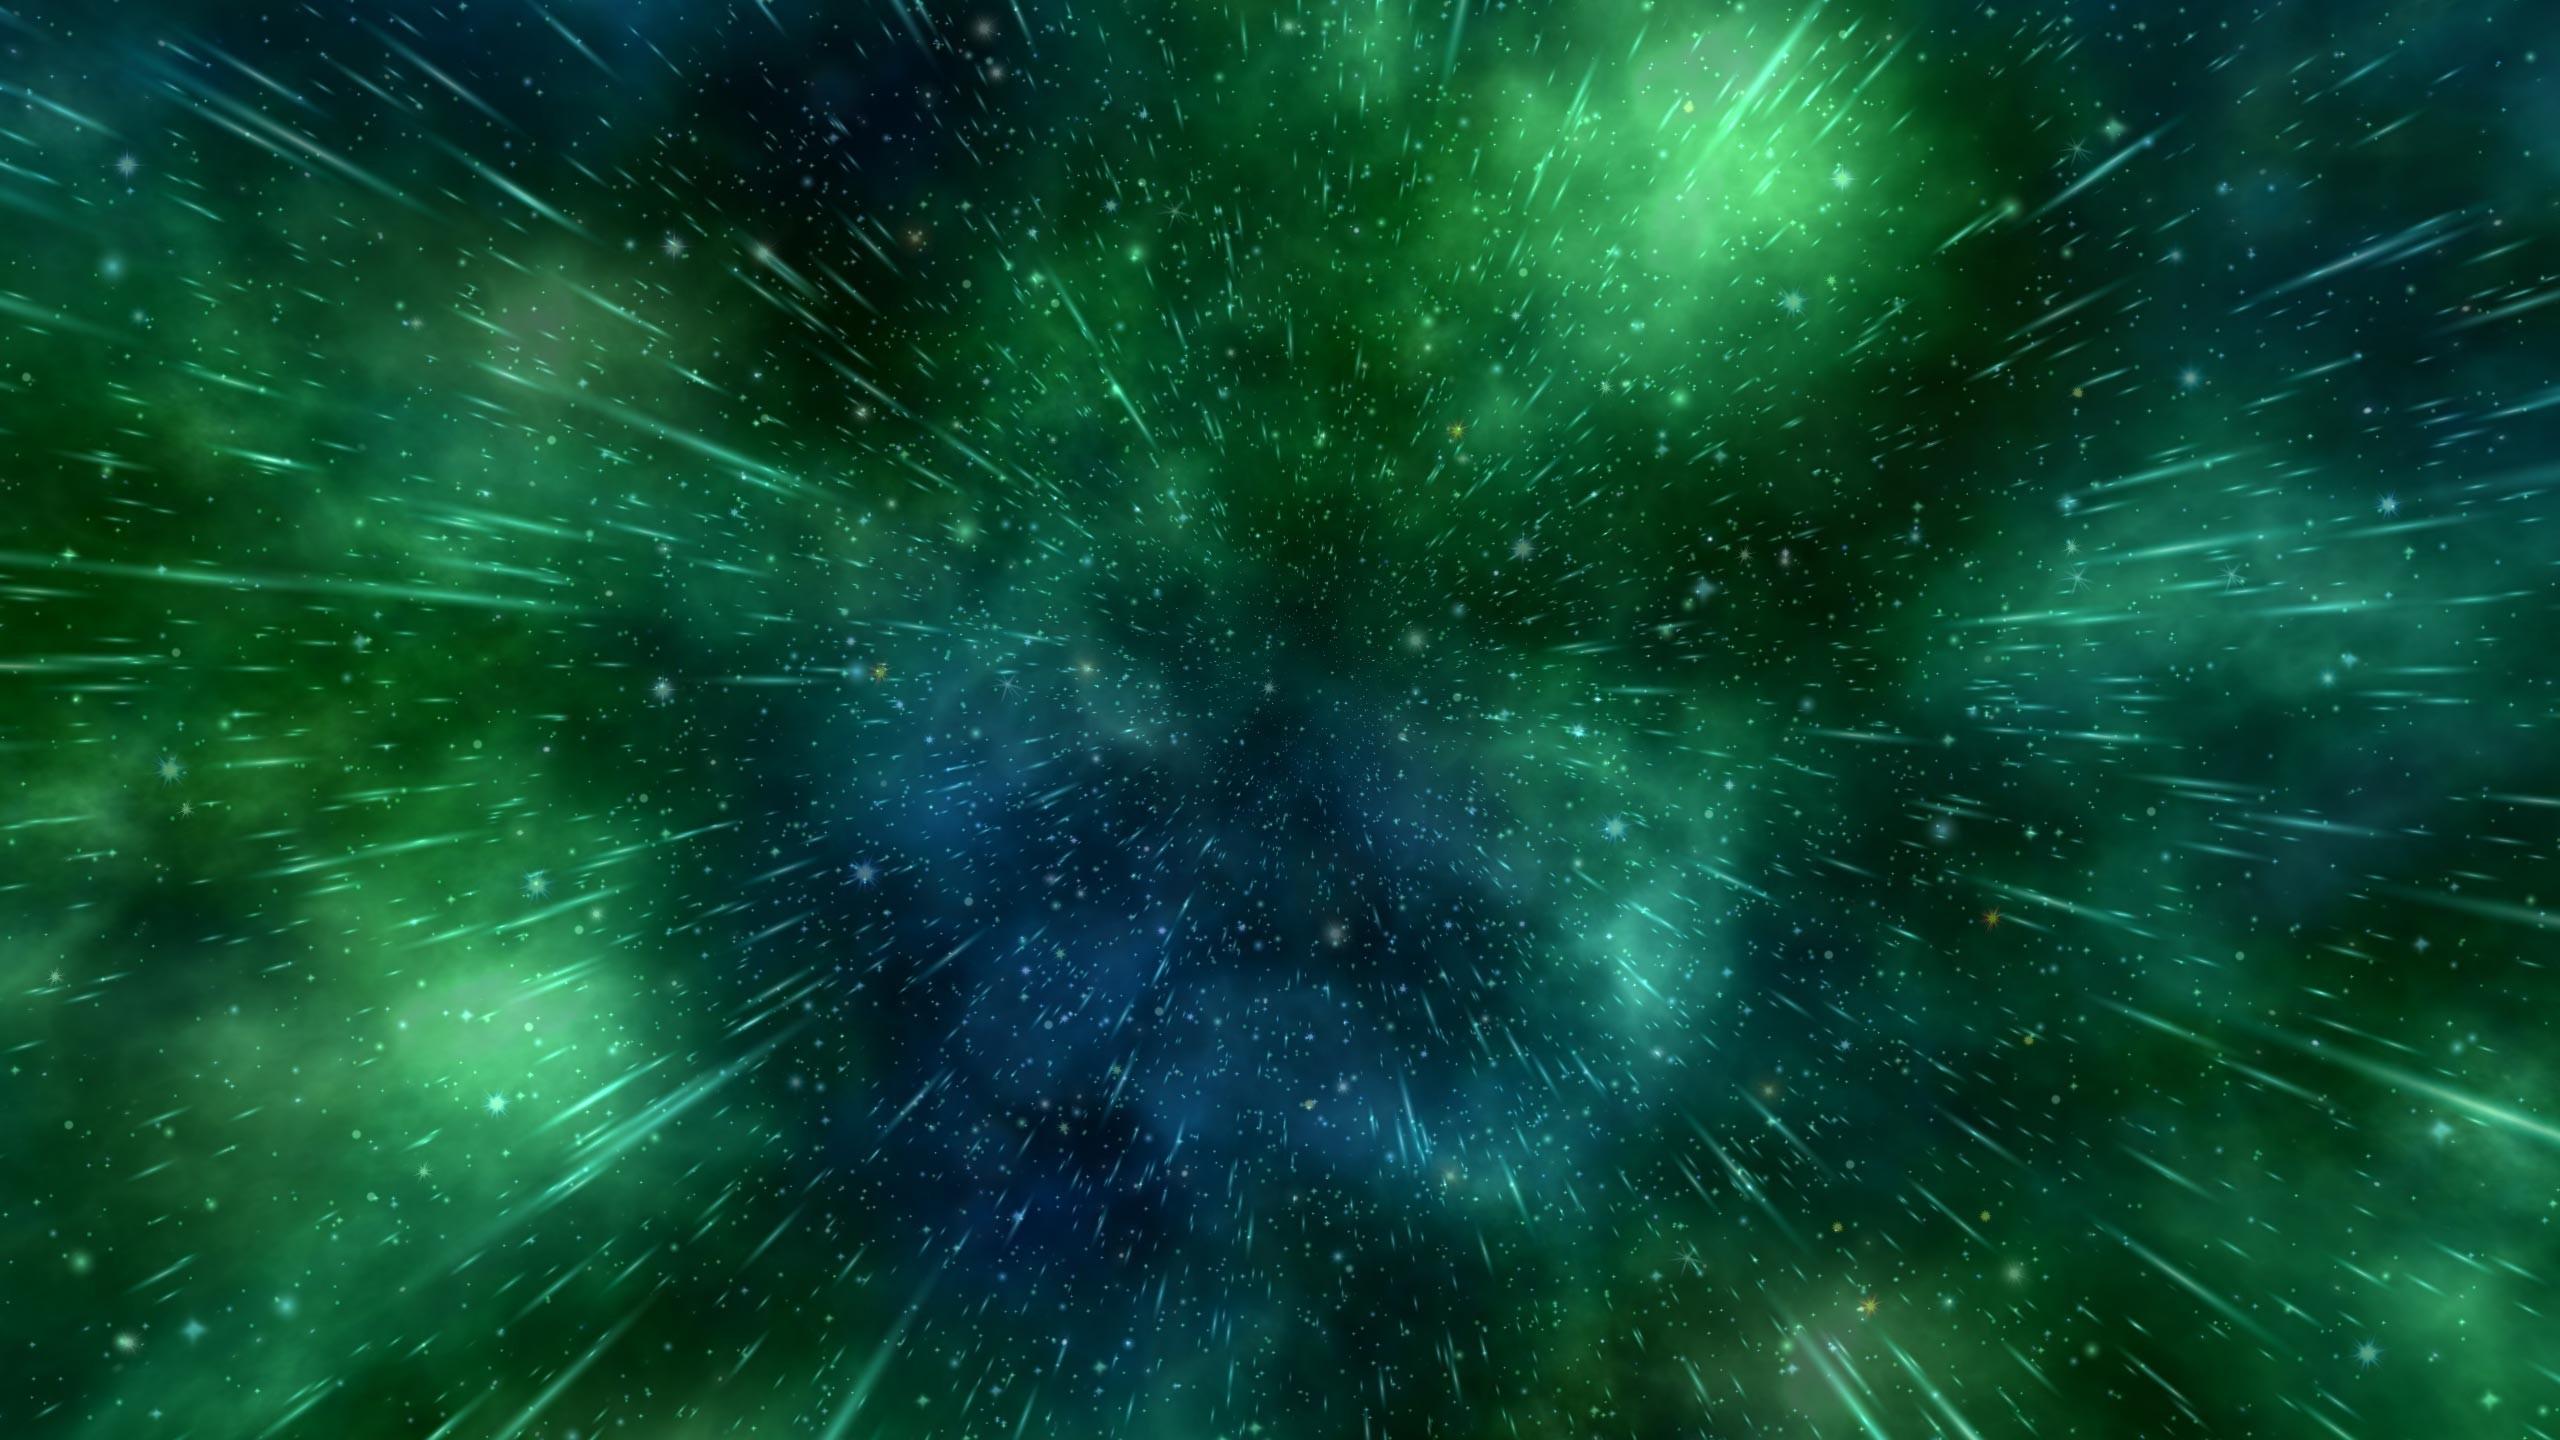 Universe Live Wallpaper